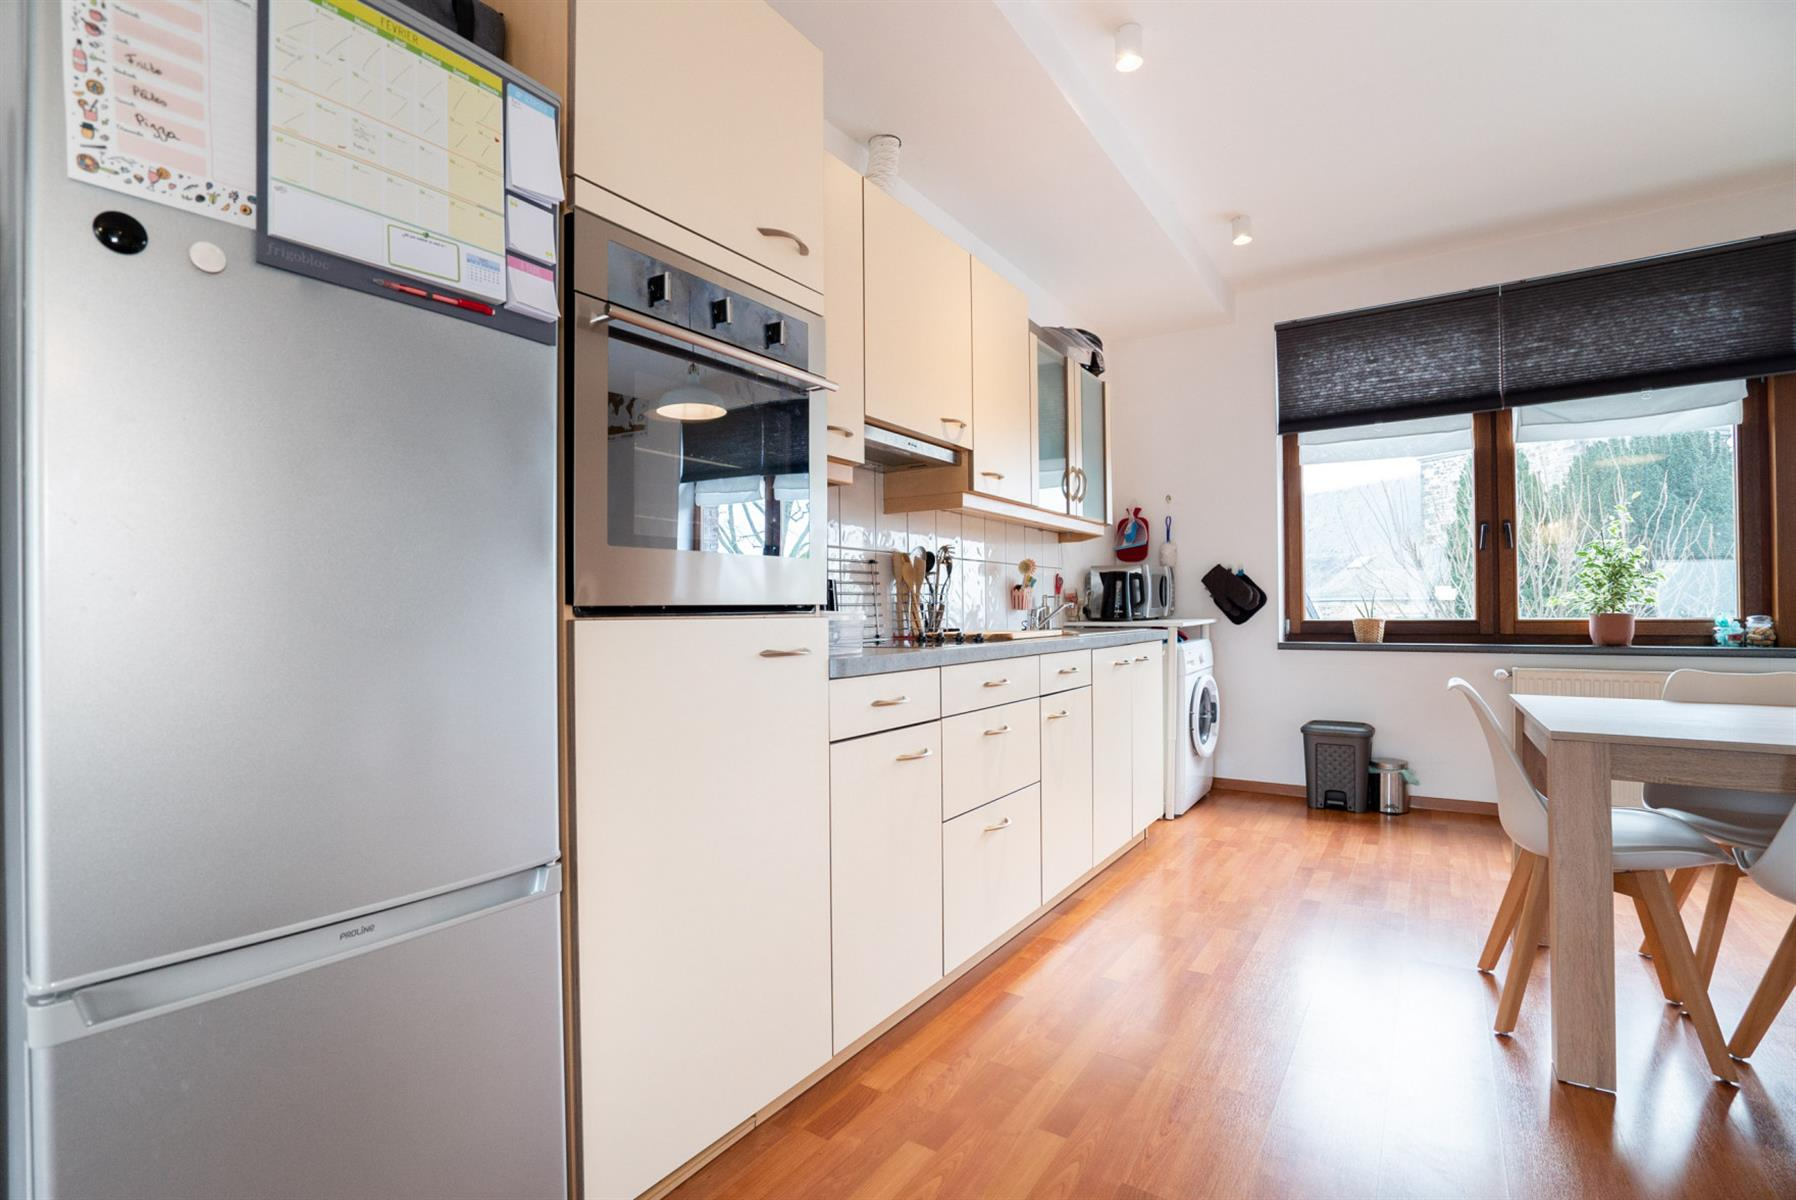 Appartement - Welkenraedt Henri-Chapelle - #4270870-3